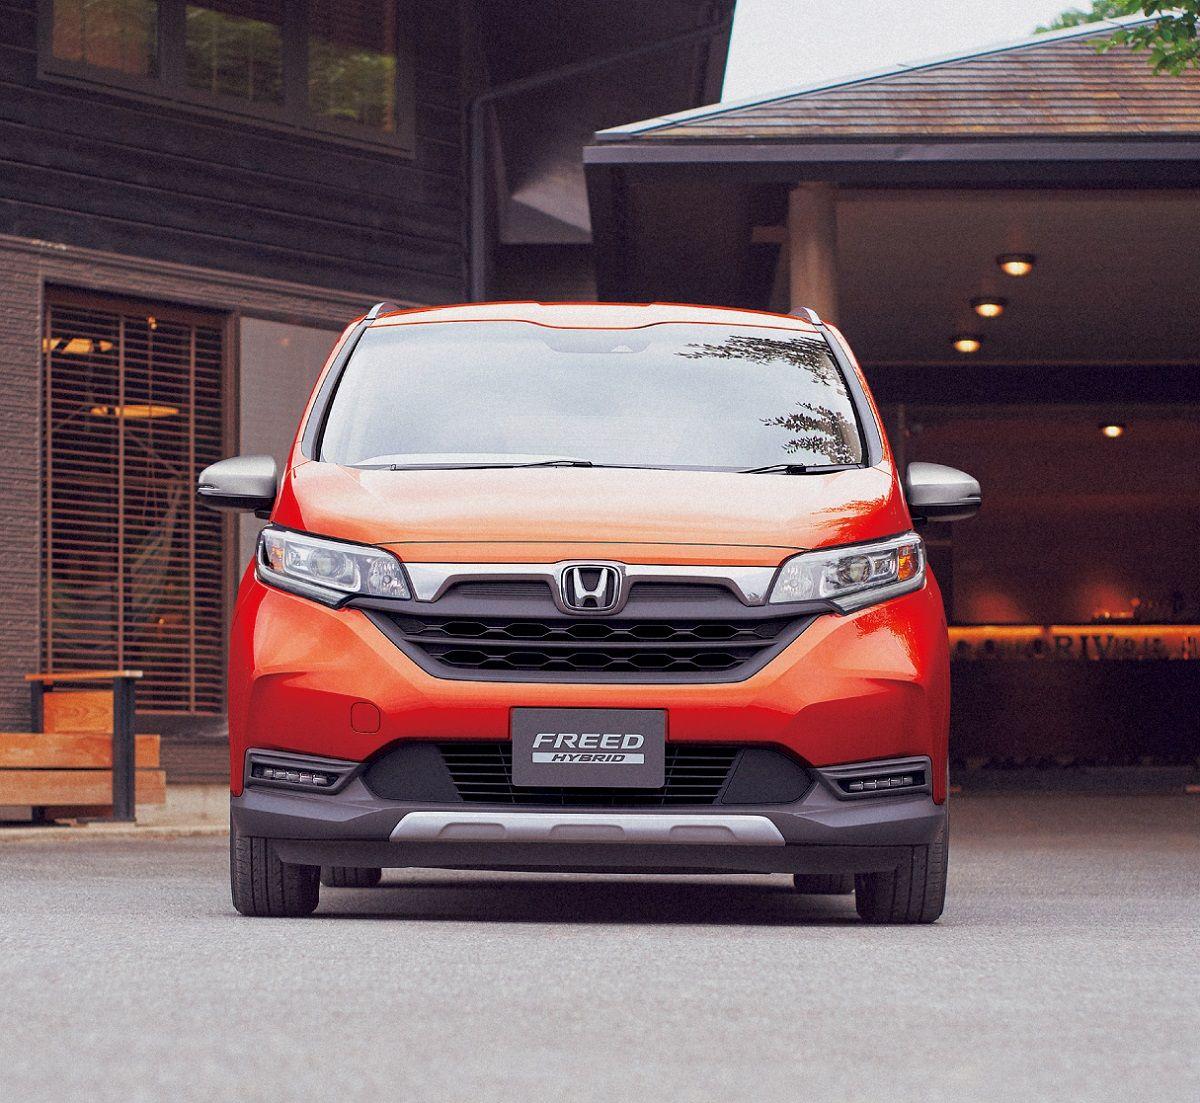 2021 Honda Freed Redesign Hybrid Specs In 2020 Honda Car Models Honda Fit Honda Fit Jazz